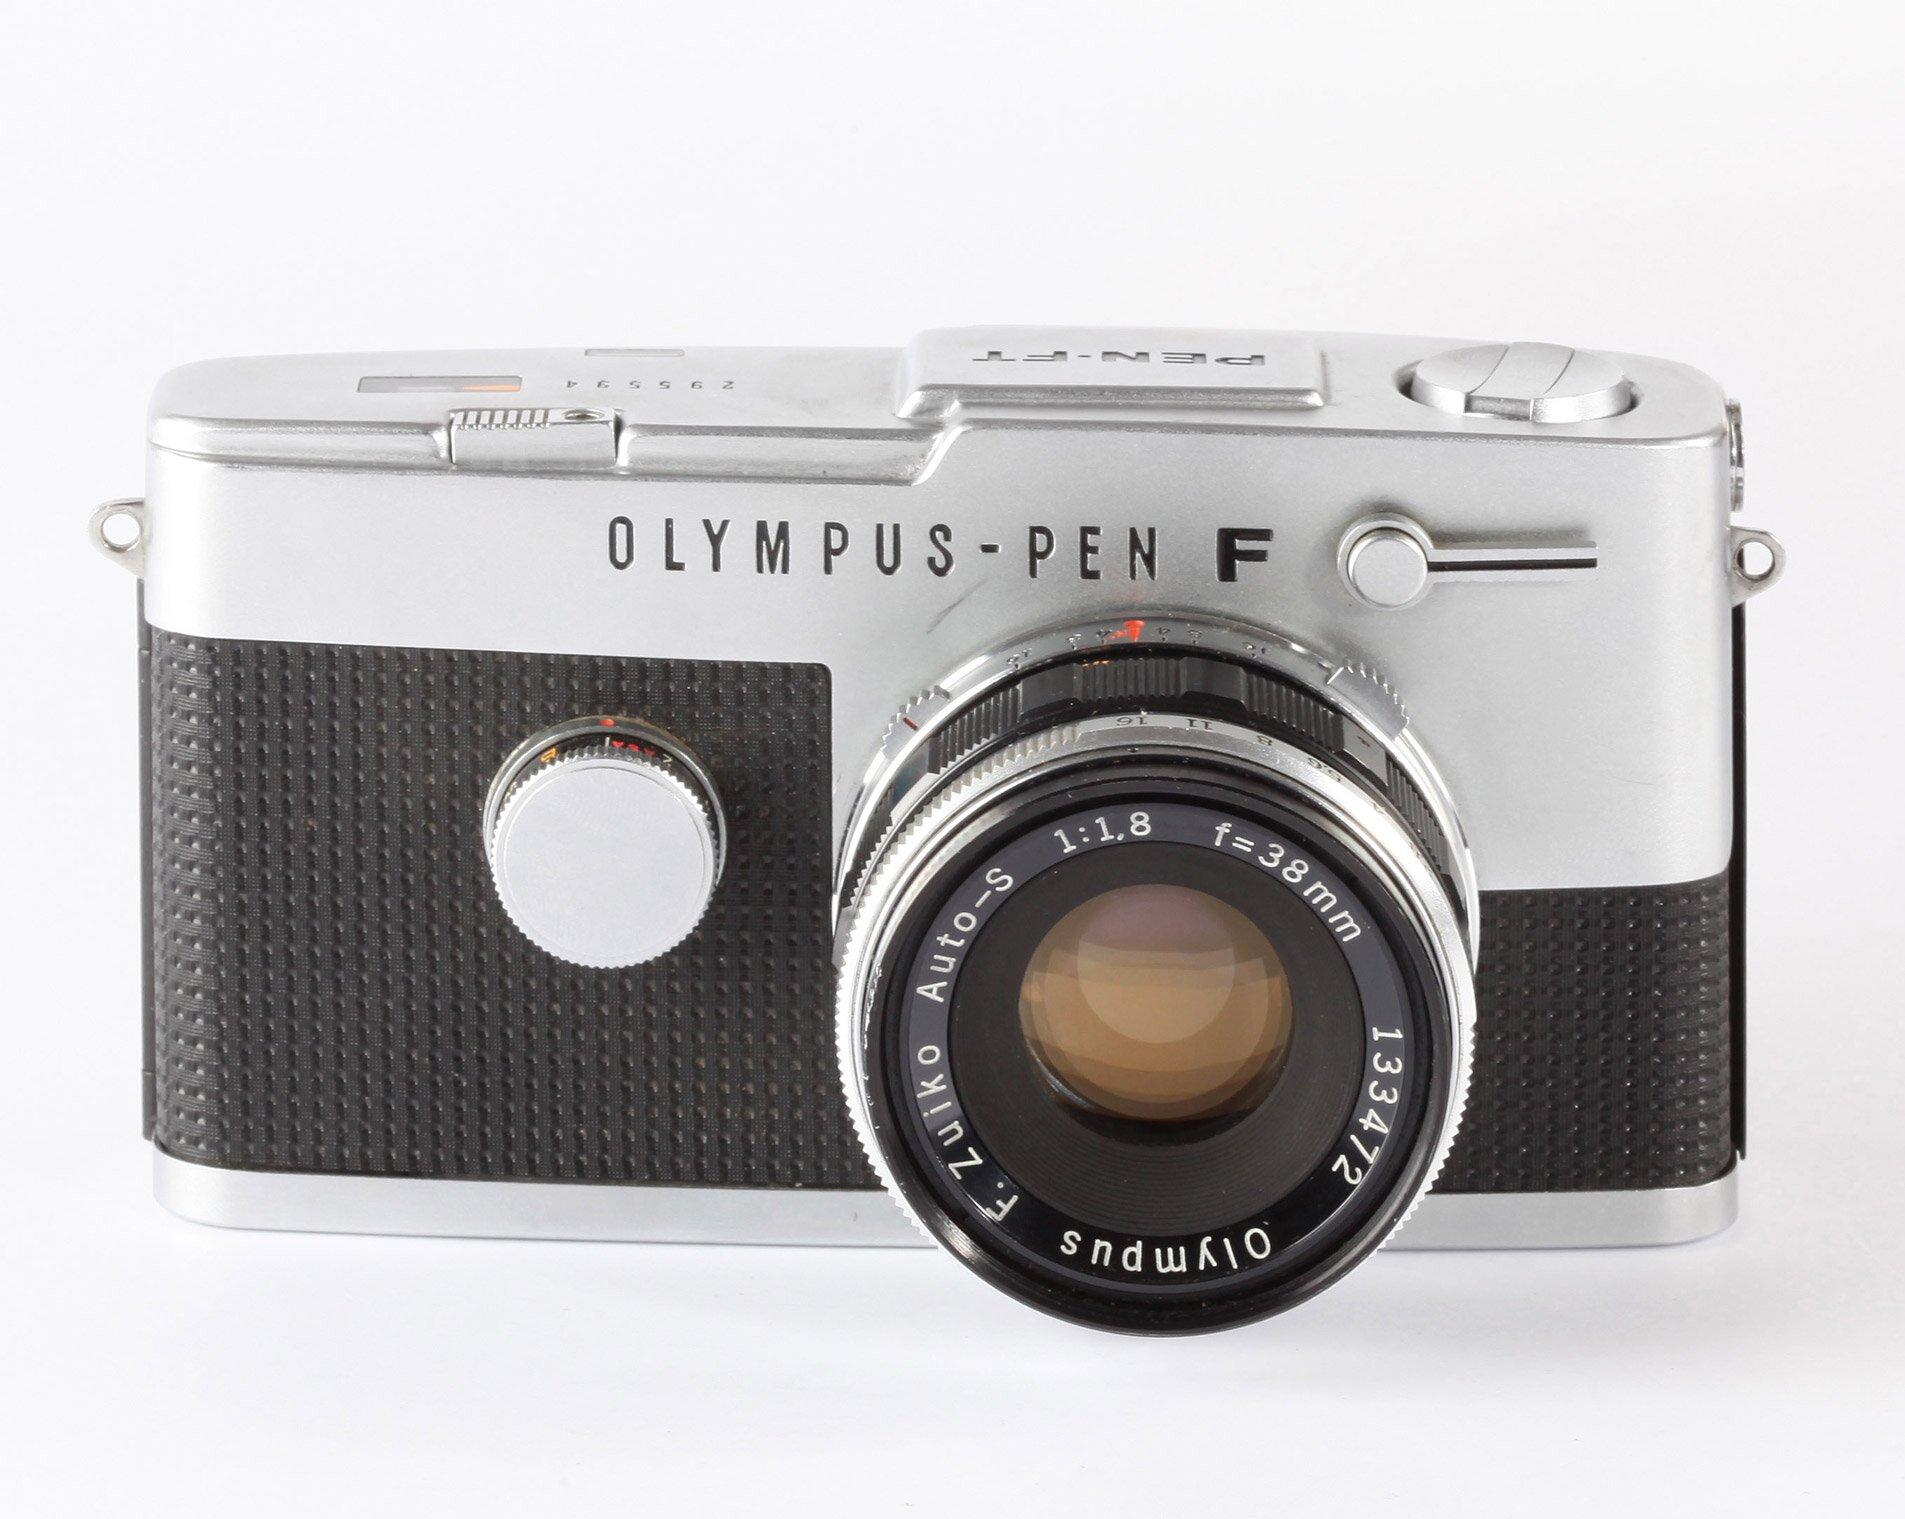 Olympus PEN FT F mit Auto-S 38mm F1.8